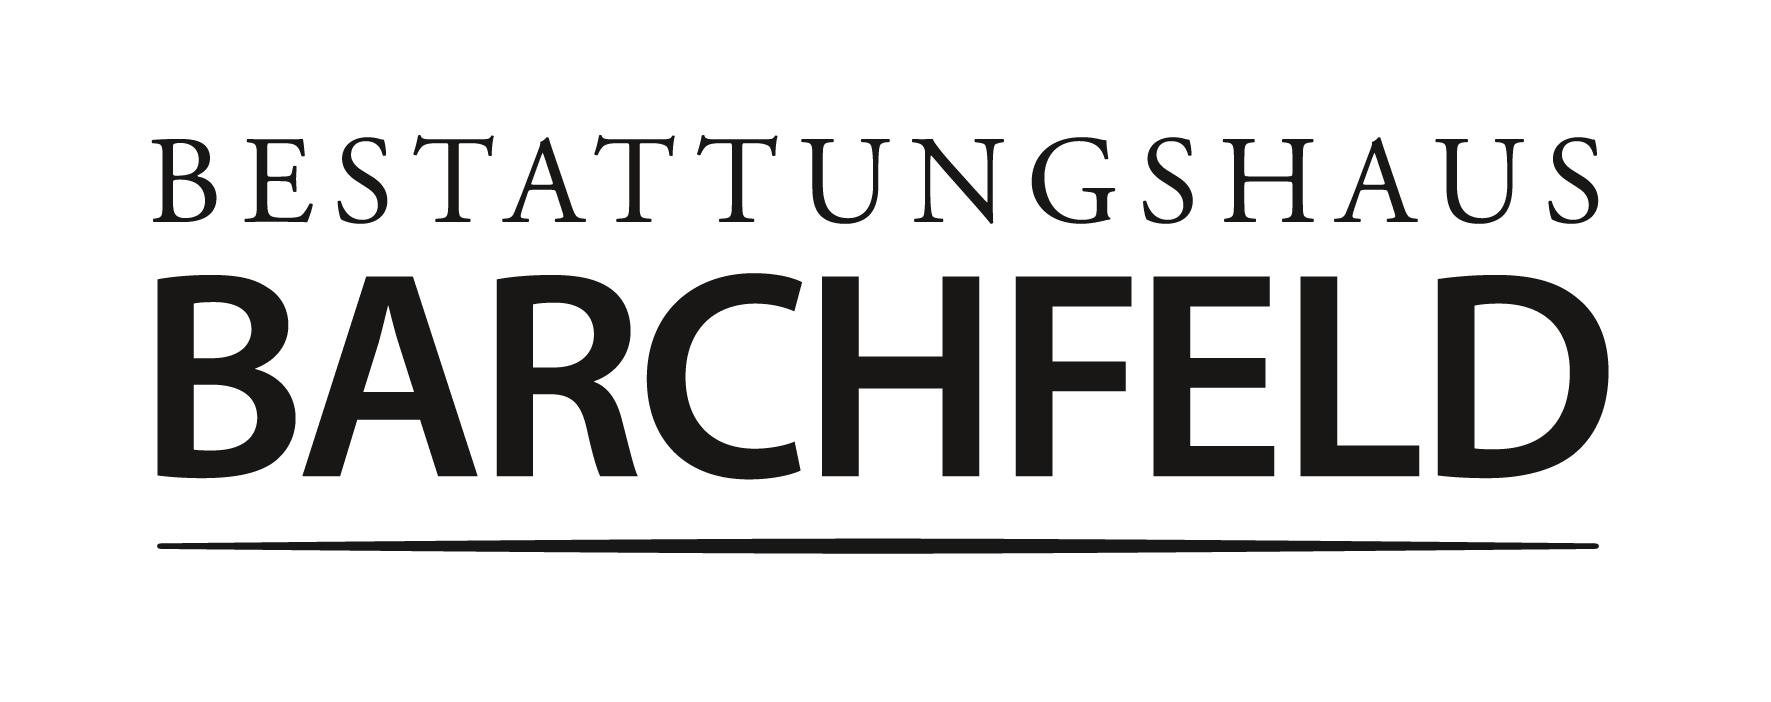 Barchfeld Bestattungen